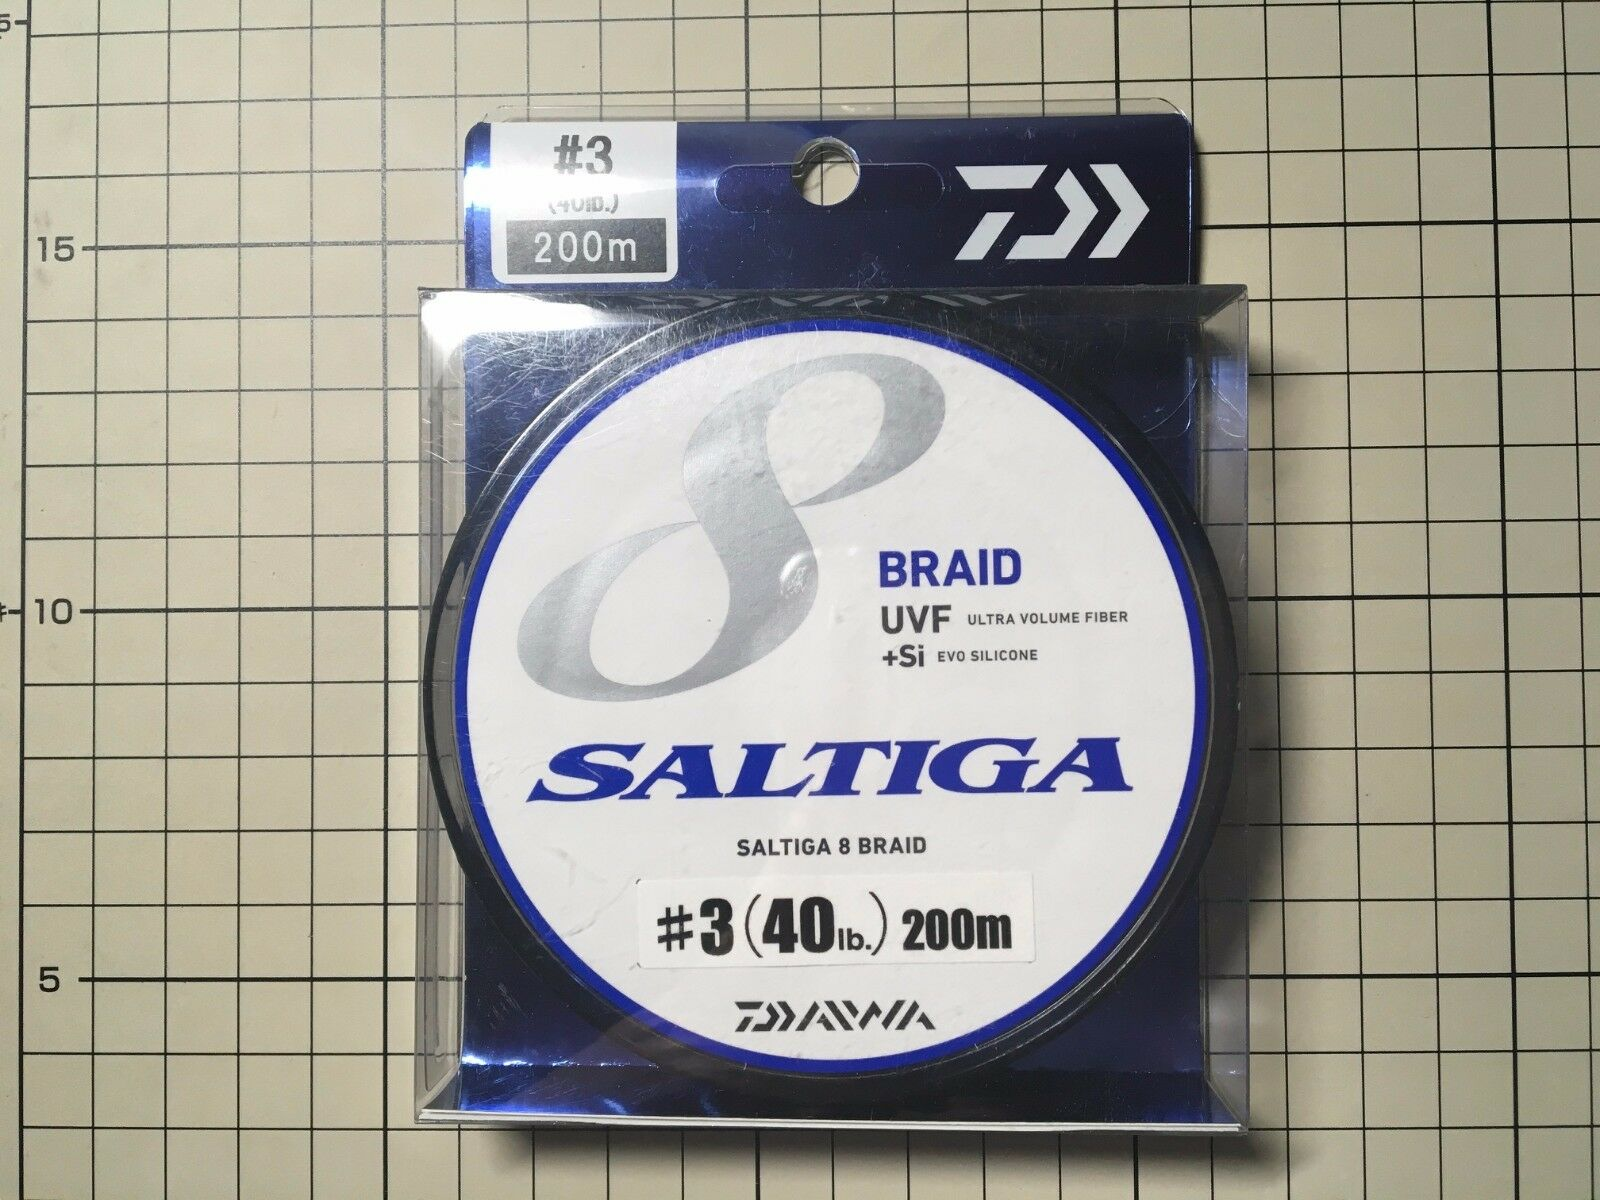 Daiwa Saltiga 8 Braid UVF +SI Evo Silicone PE line  3 (40lb) 200m